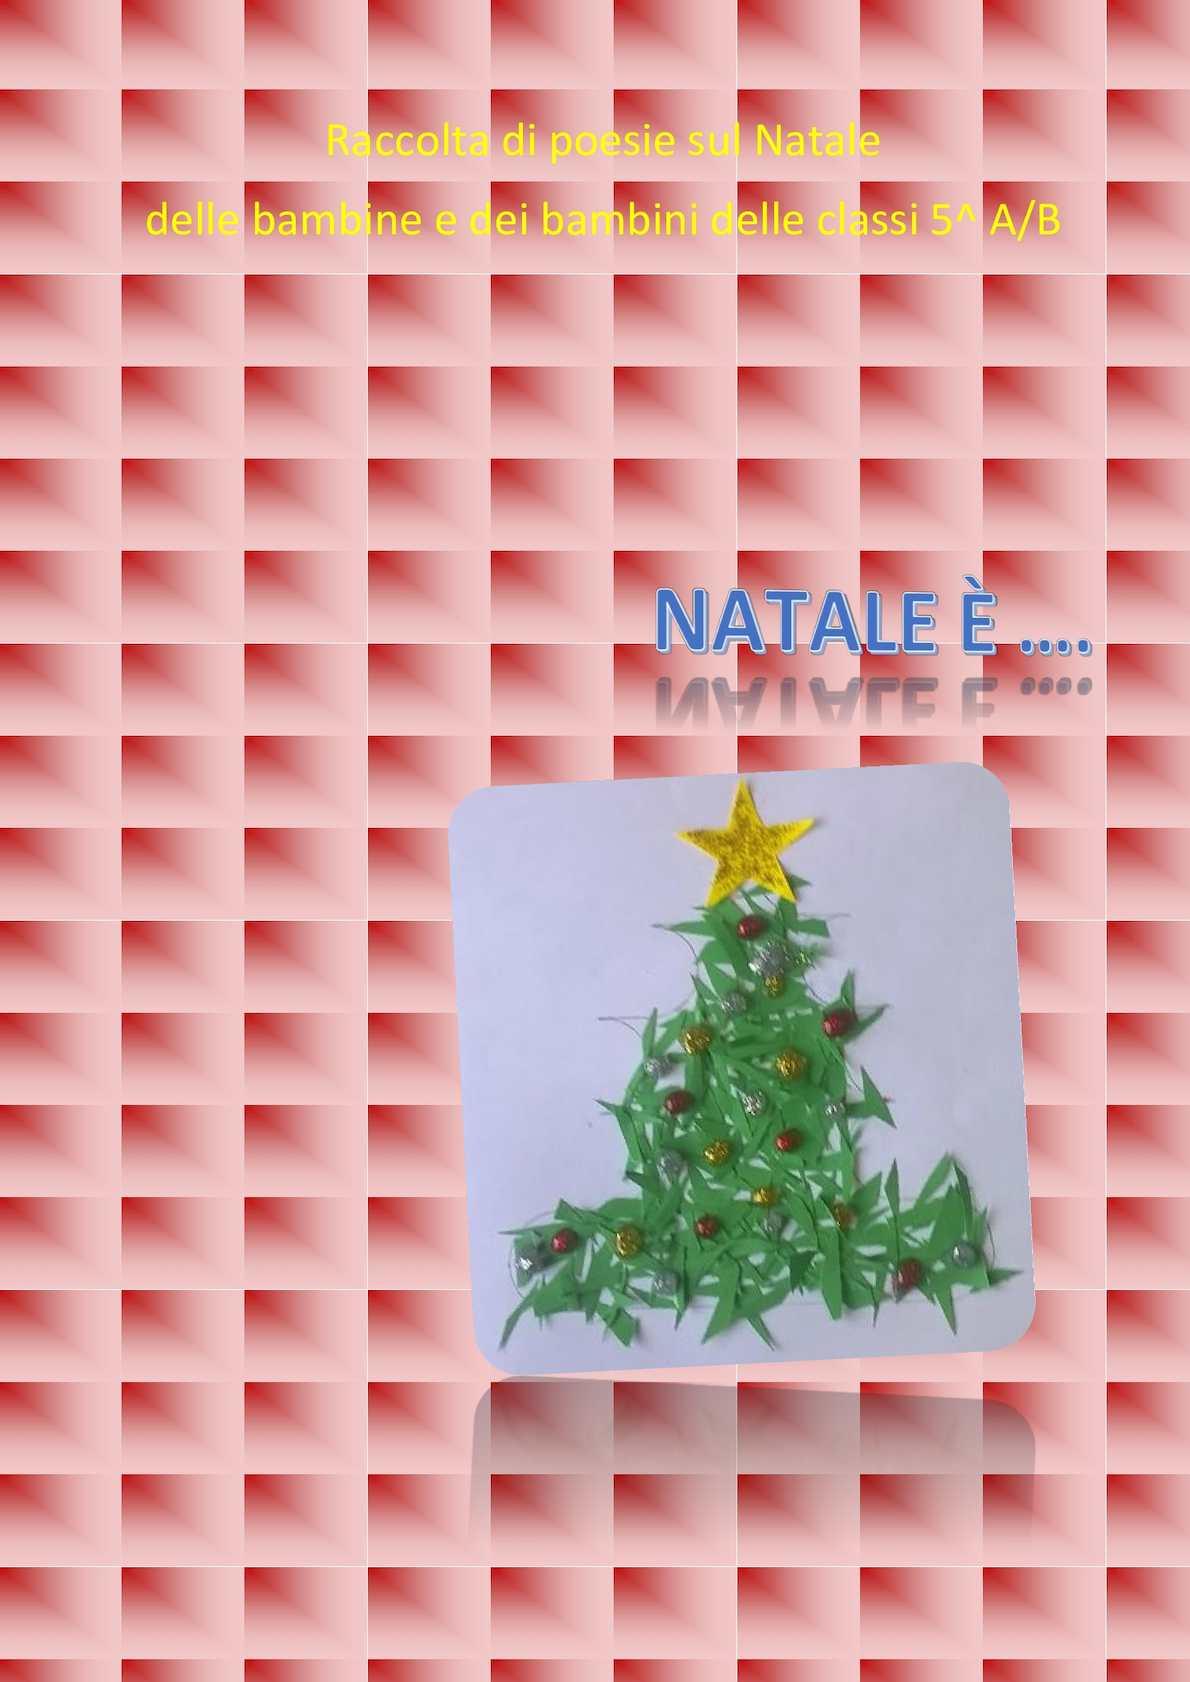 Poesie Di Natalecom.Calameo Raccolta Di Poesie Sul Natale 5